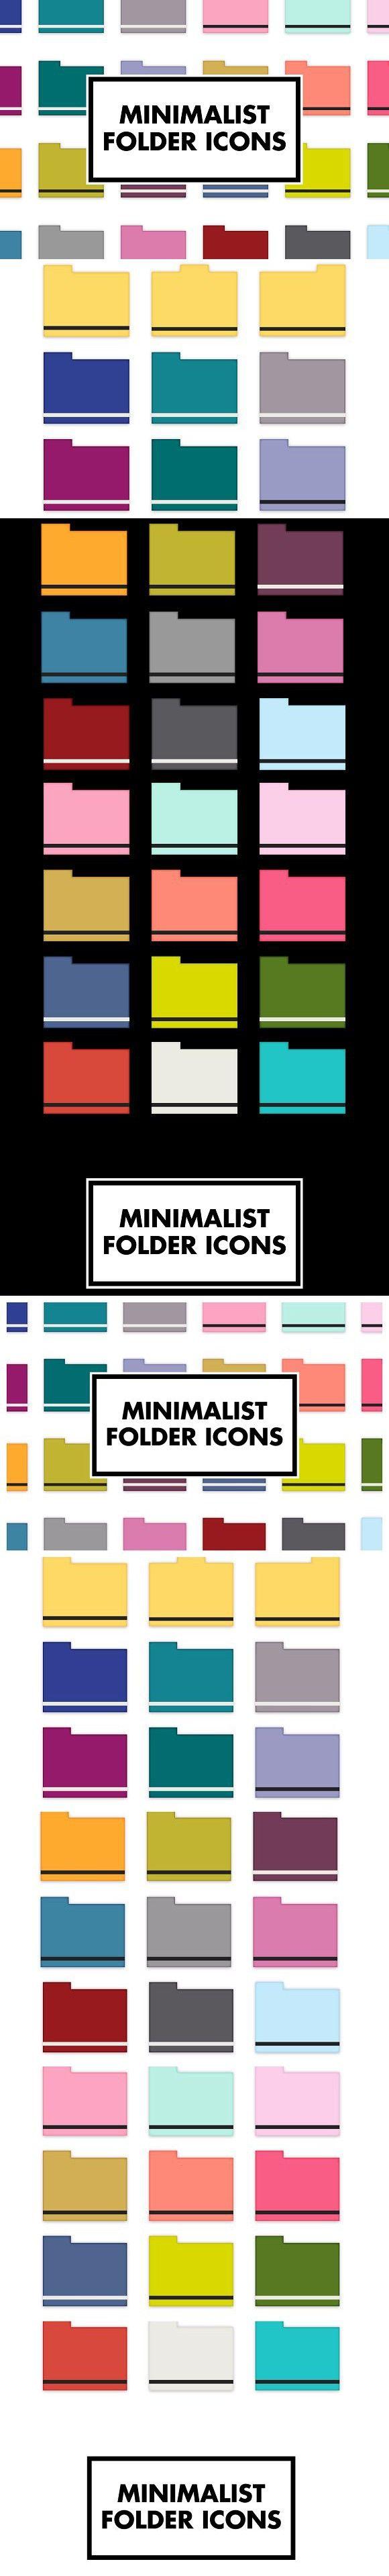 Minimalist Folder Icons Folder icon, Icon, Desktop icons